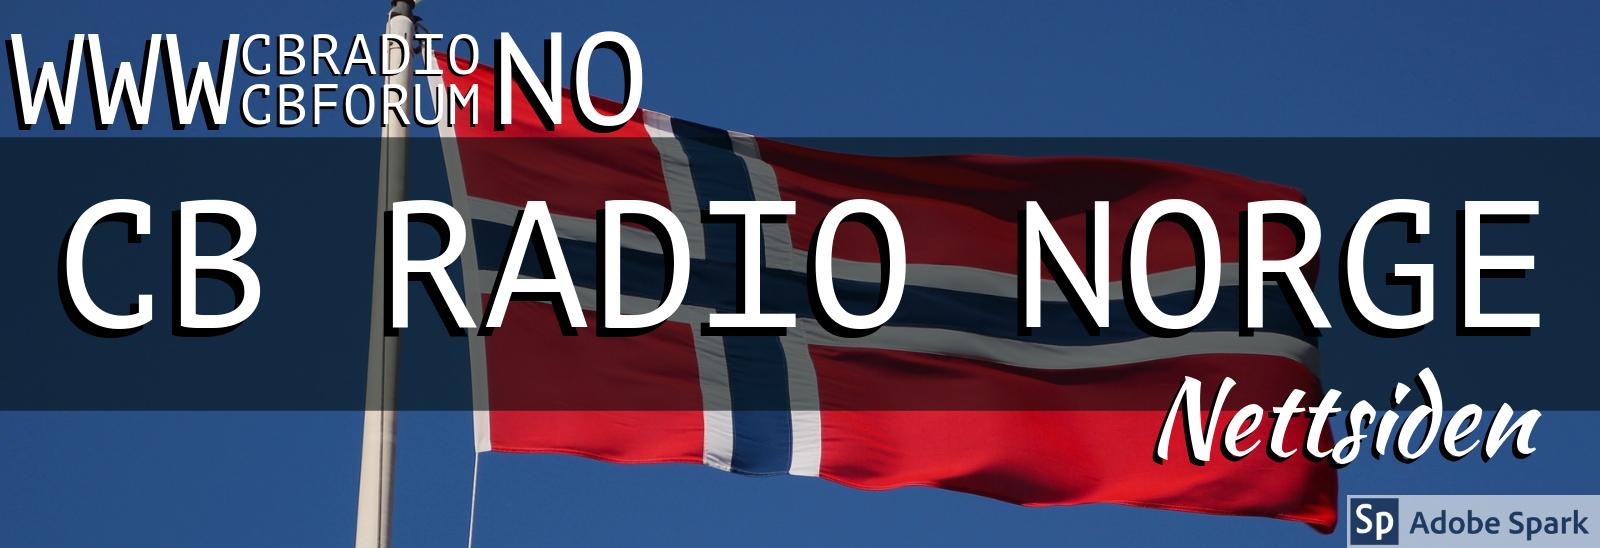 CB Radio Norge